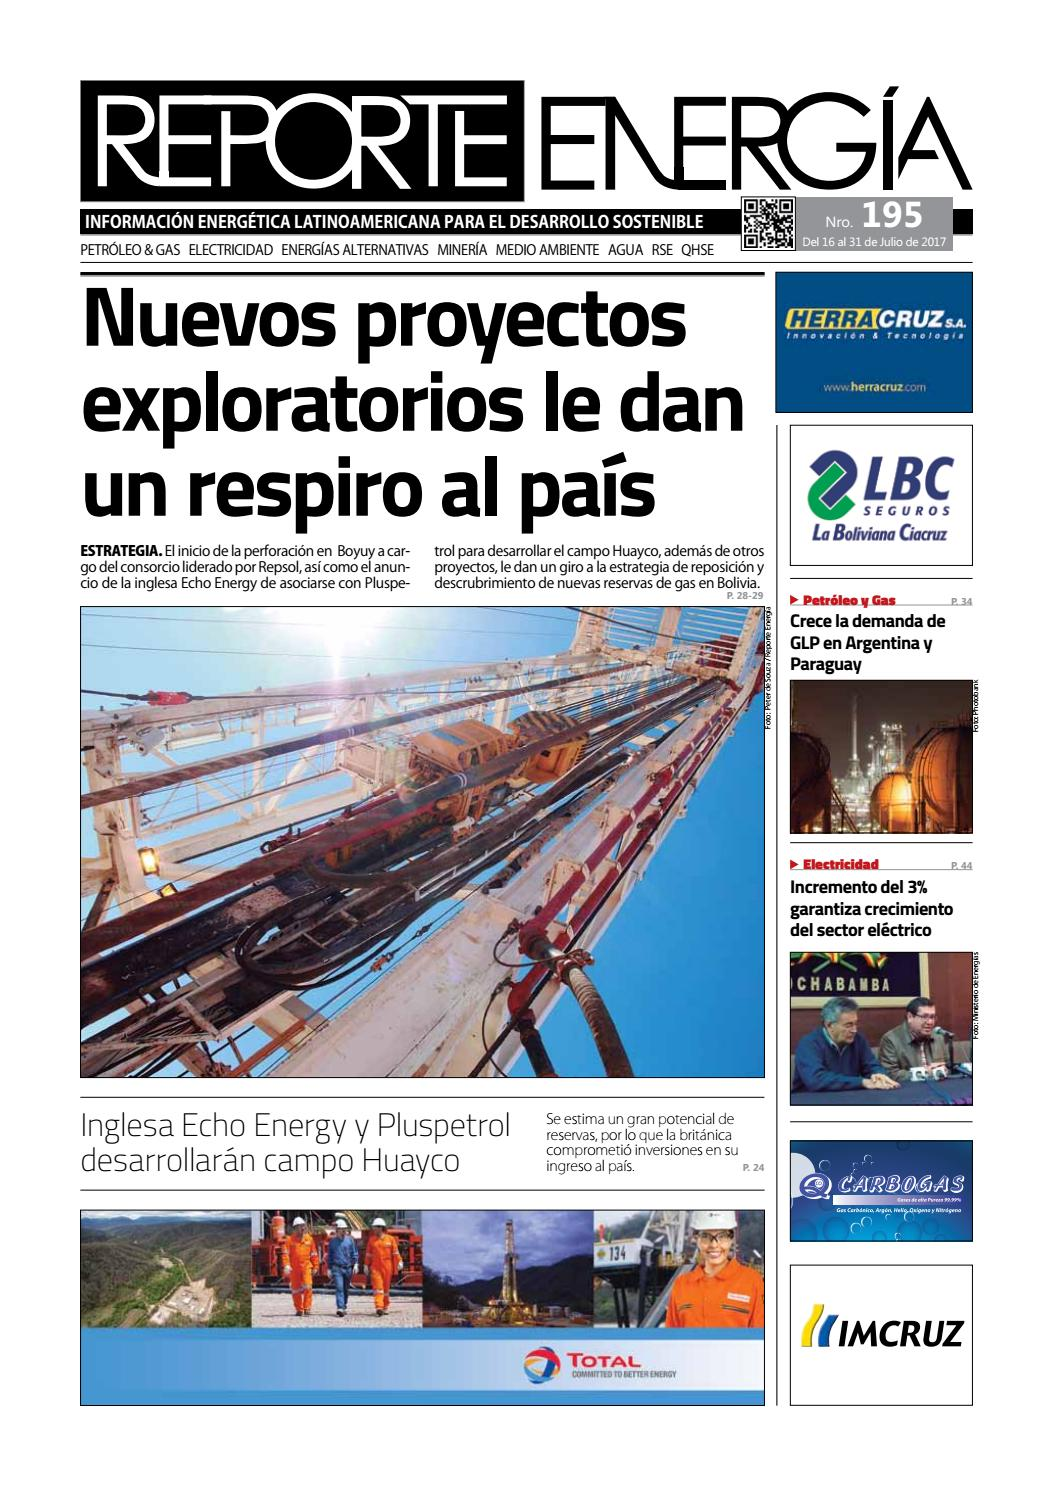 Reporte Energía - Edición 195 by Branko Zabala - issuu